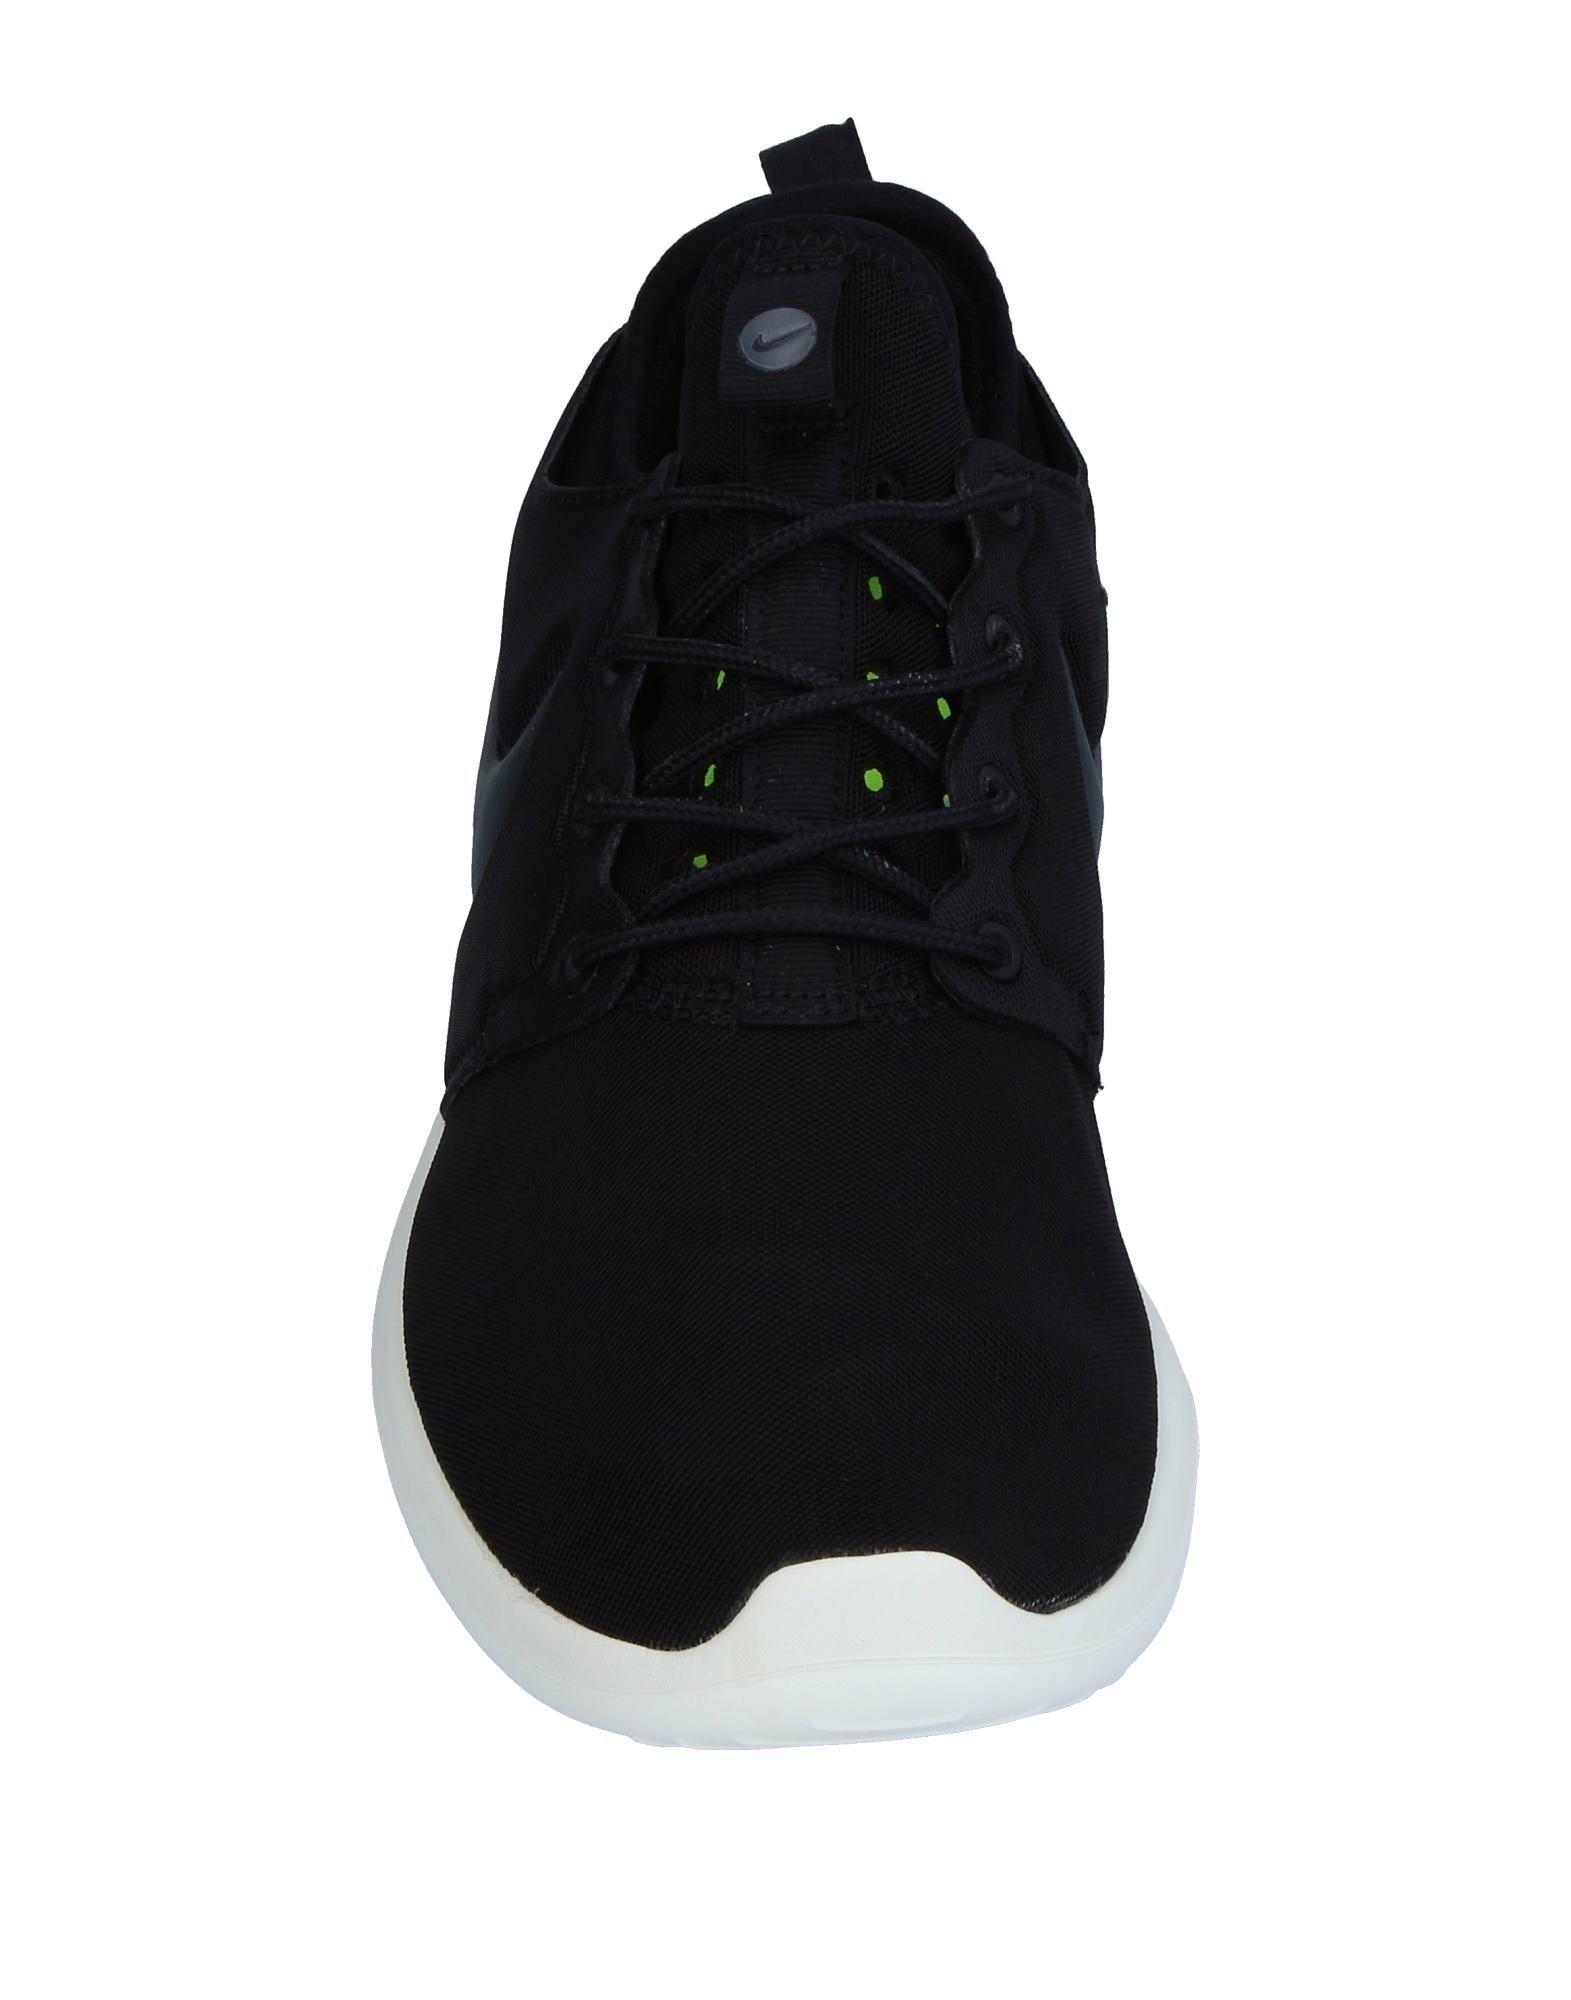 Rabatt echte Schuhe Herren Nike Sneakers Herren Schuhe  11335659XJ 204fe7